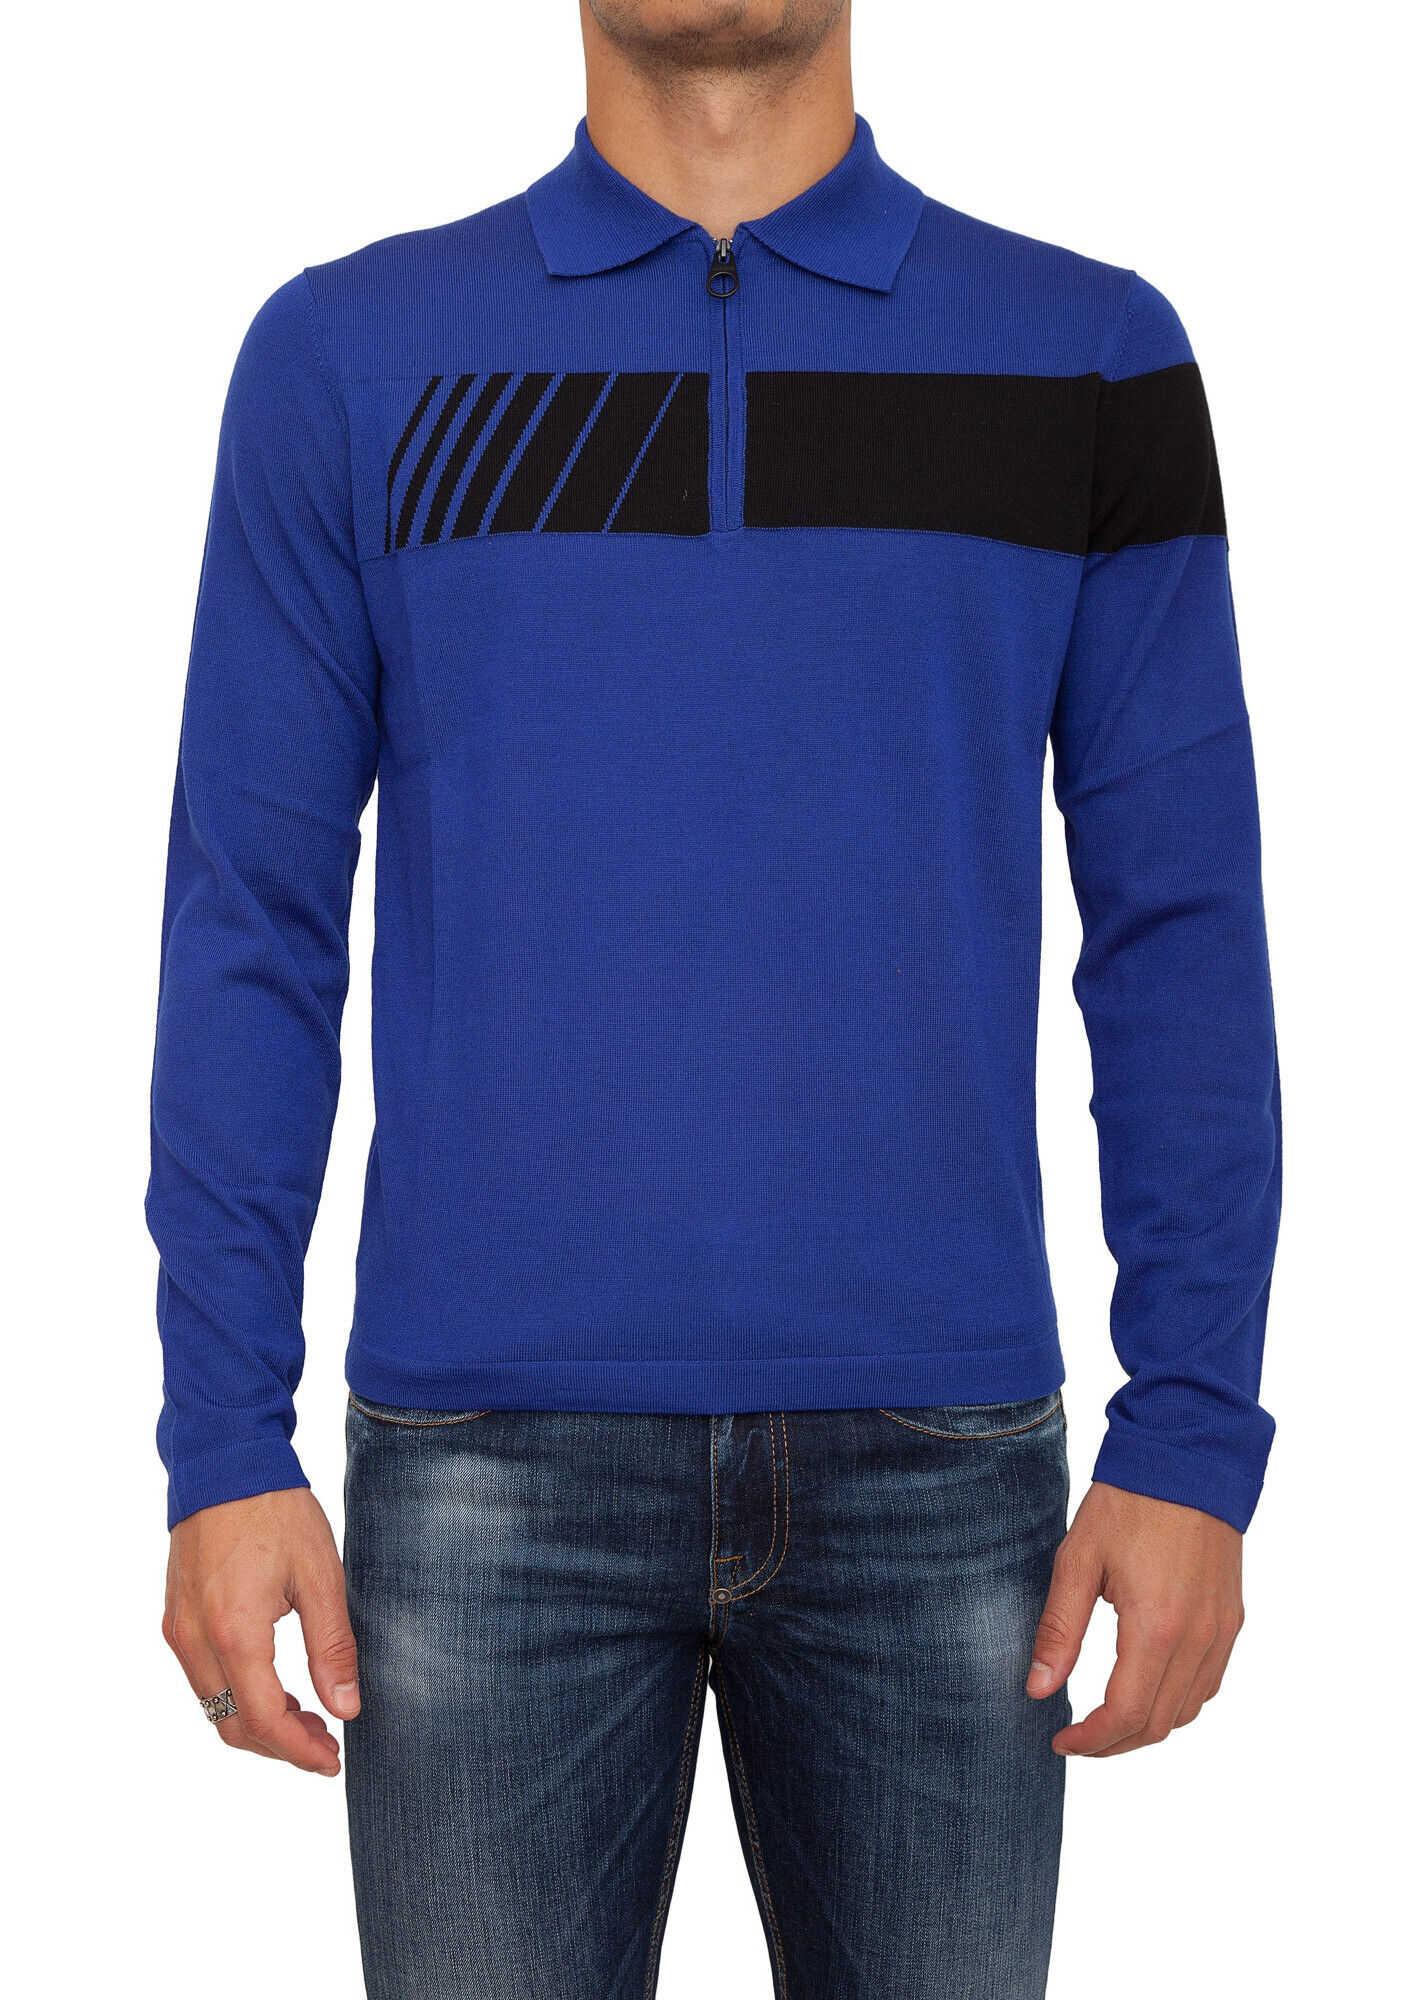 Bikkembergs 7FC01077 BLUE